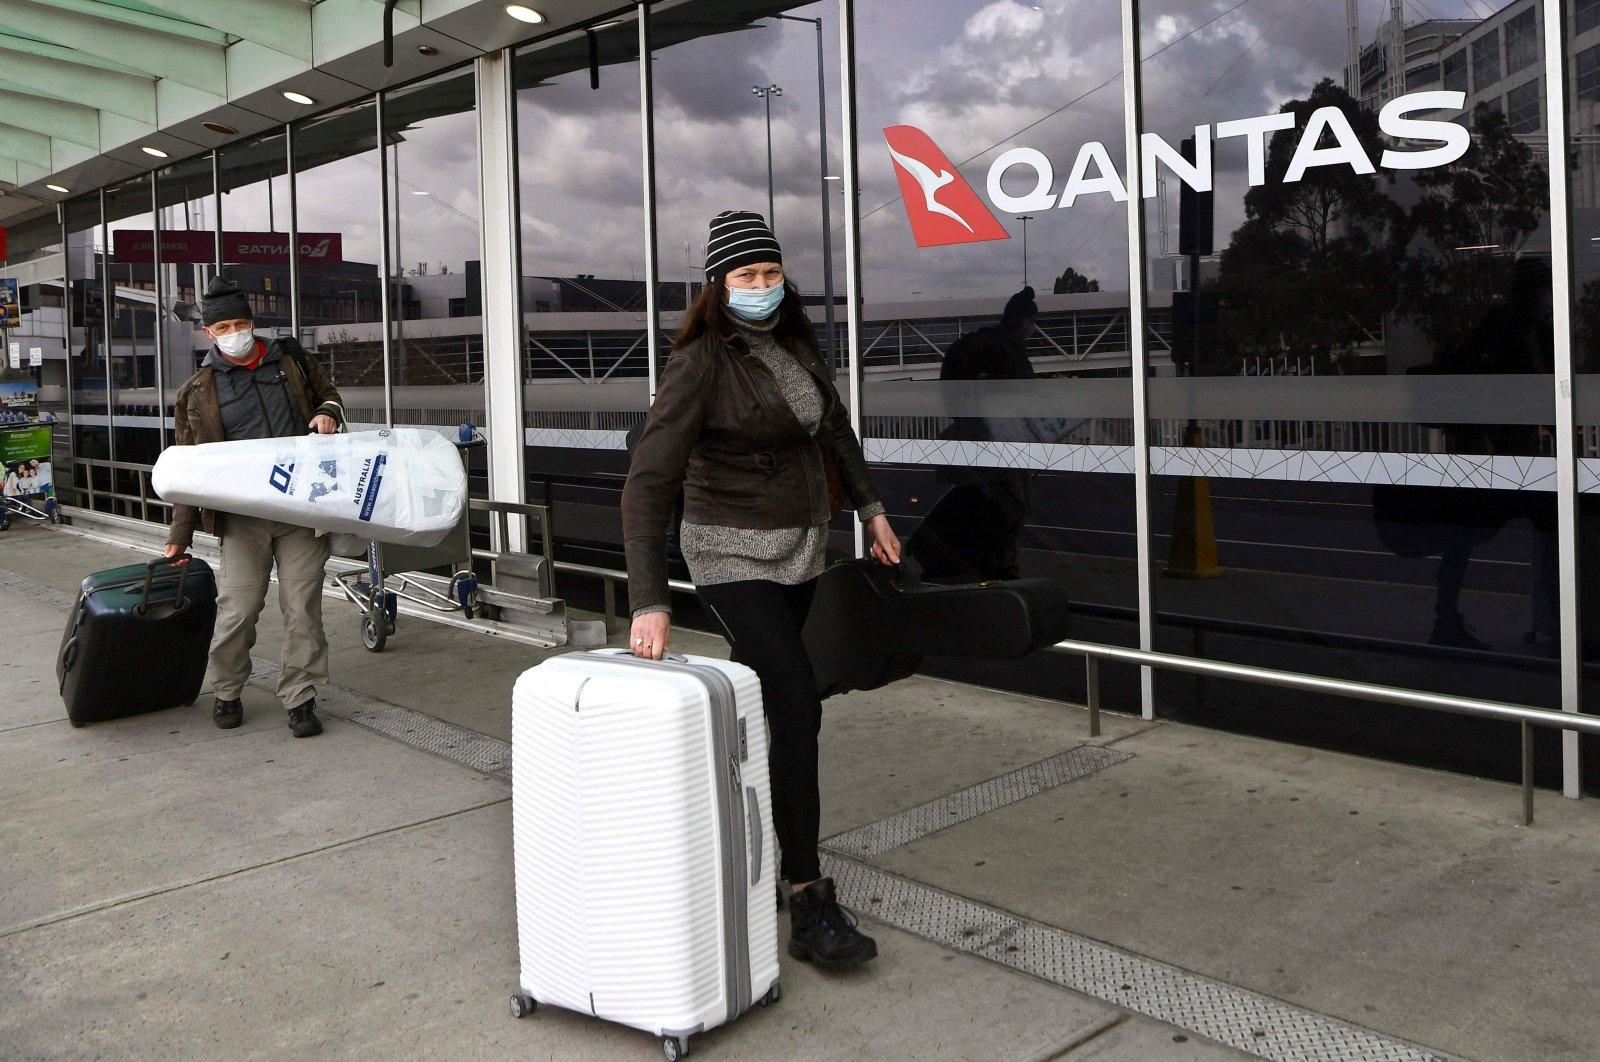 Travelers arrive at a deserted Qantas terminal at Melbourne Airport, Melbourne, Australia, Aug. 26, 2021. (AFP Photo)